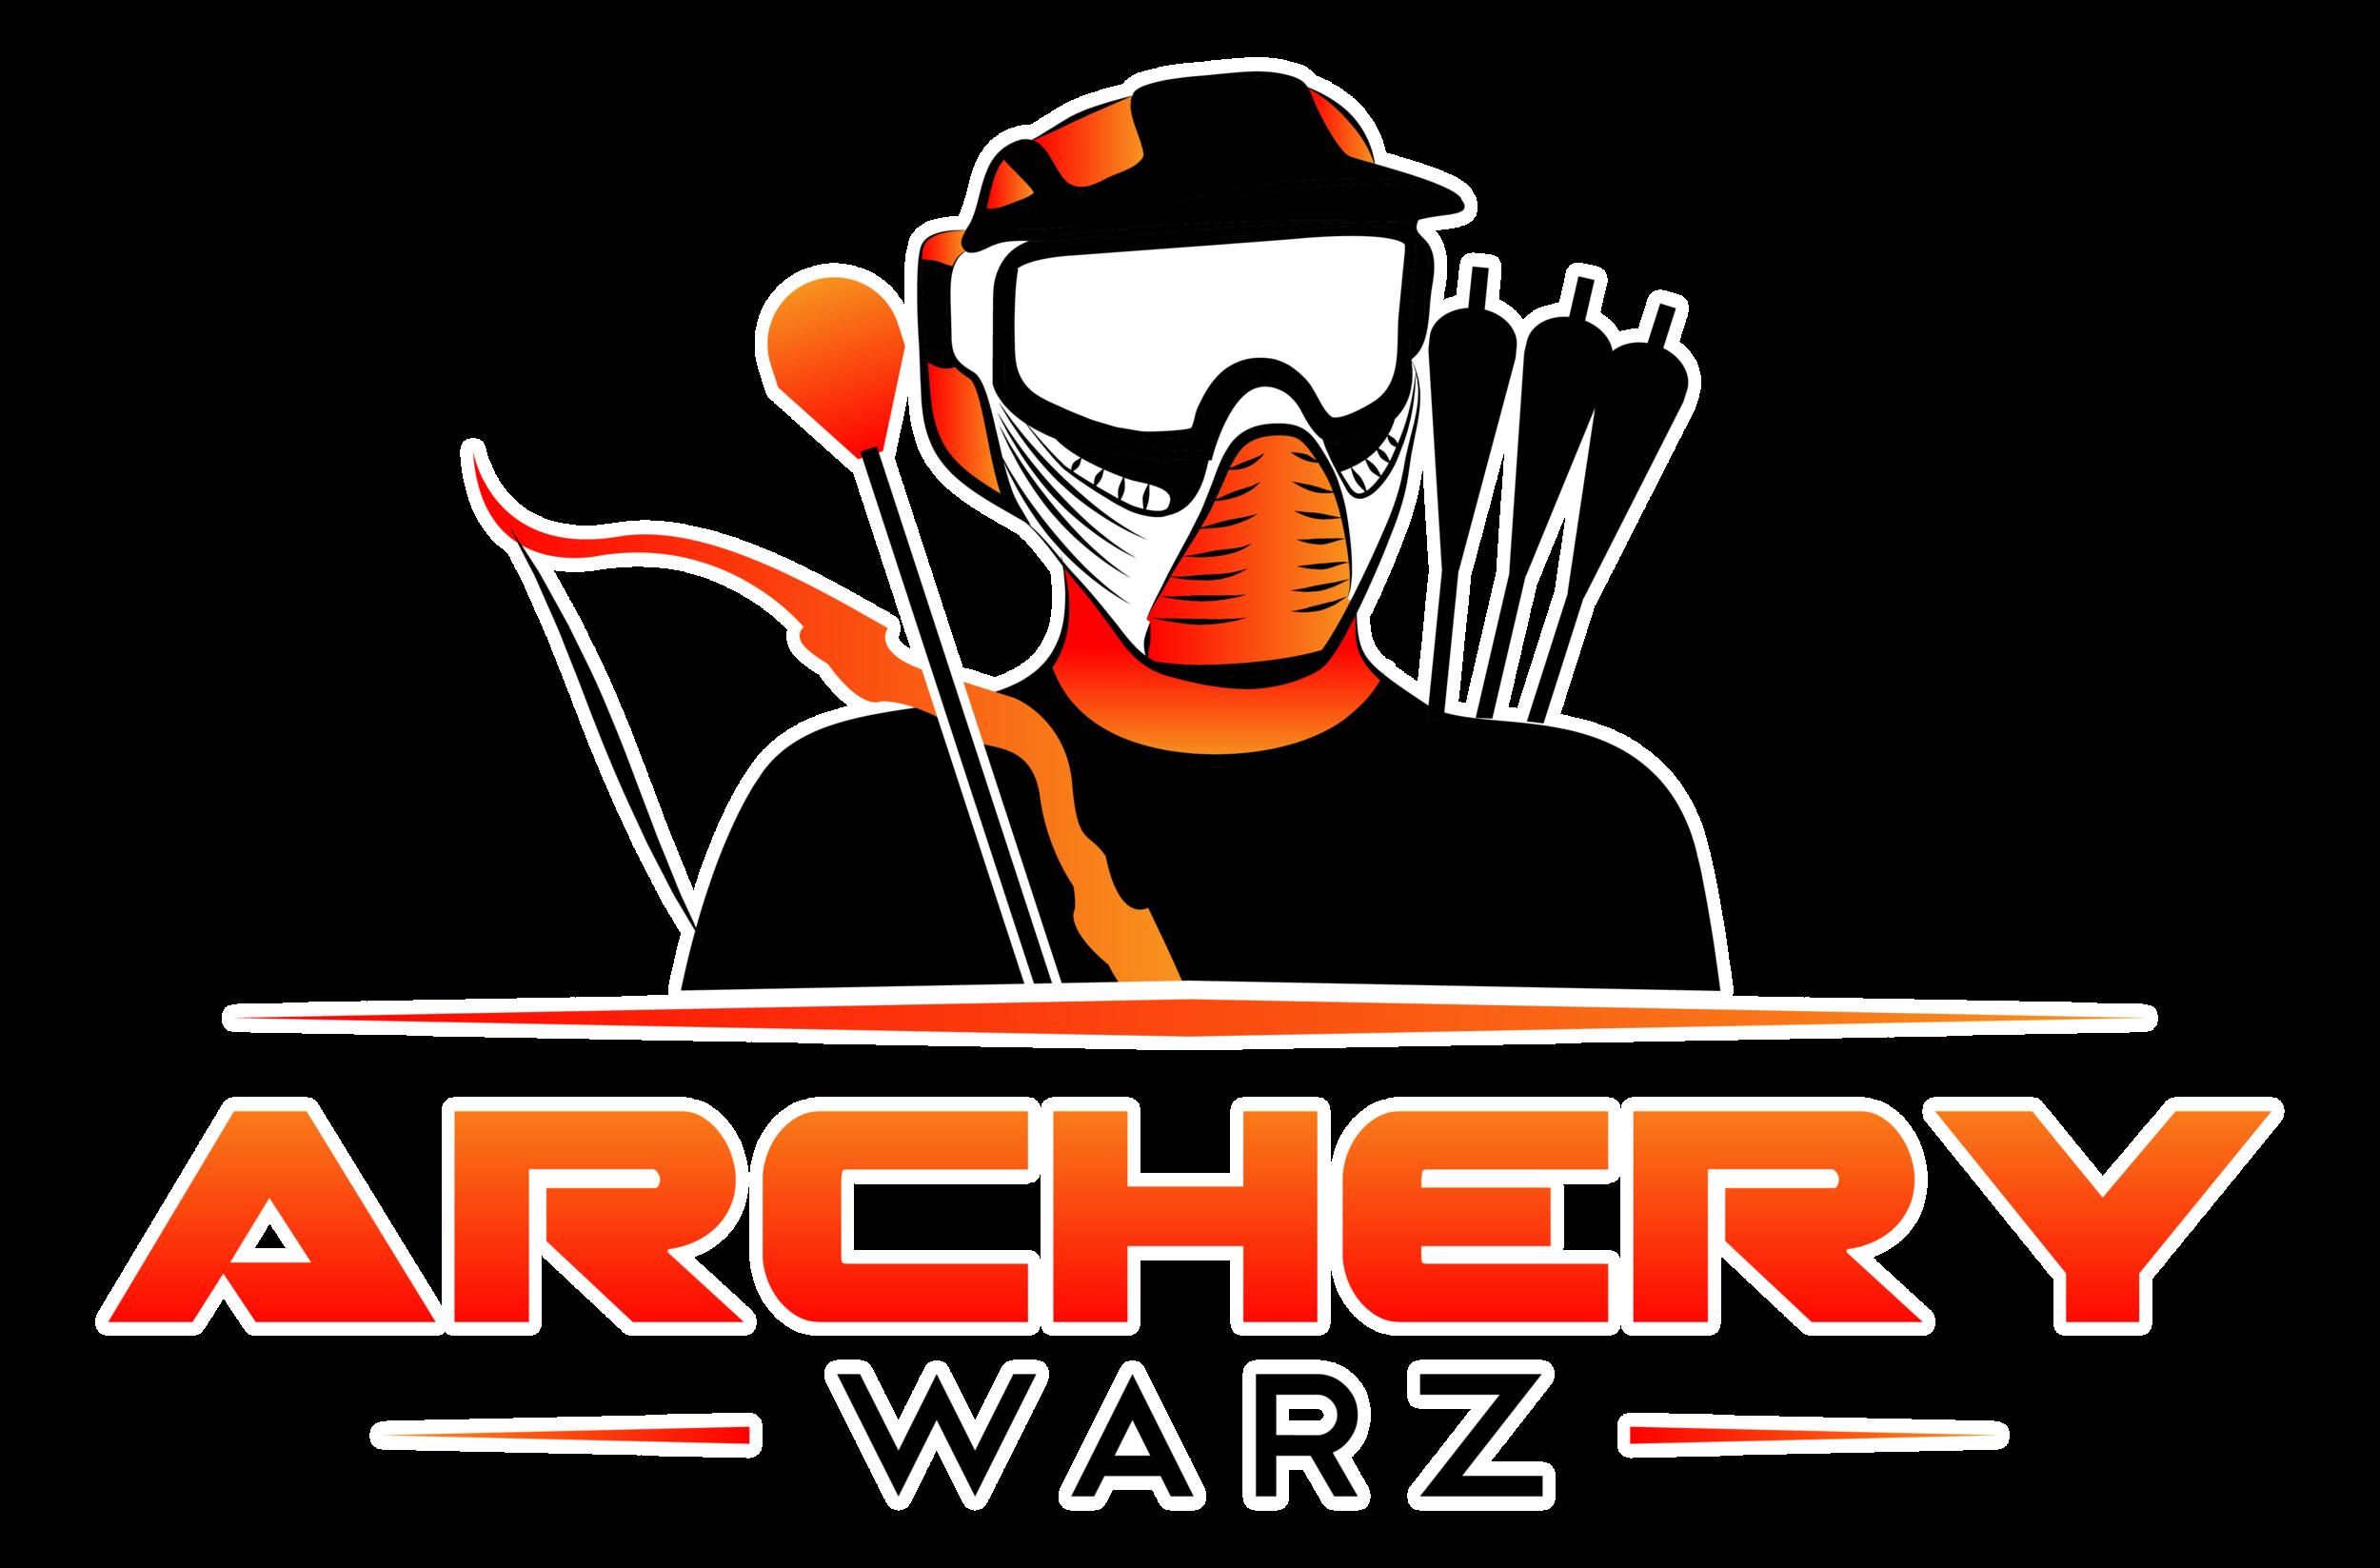 Archery Warz-01 cropped.png